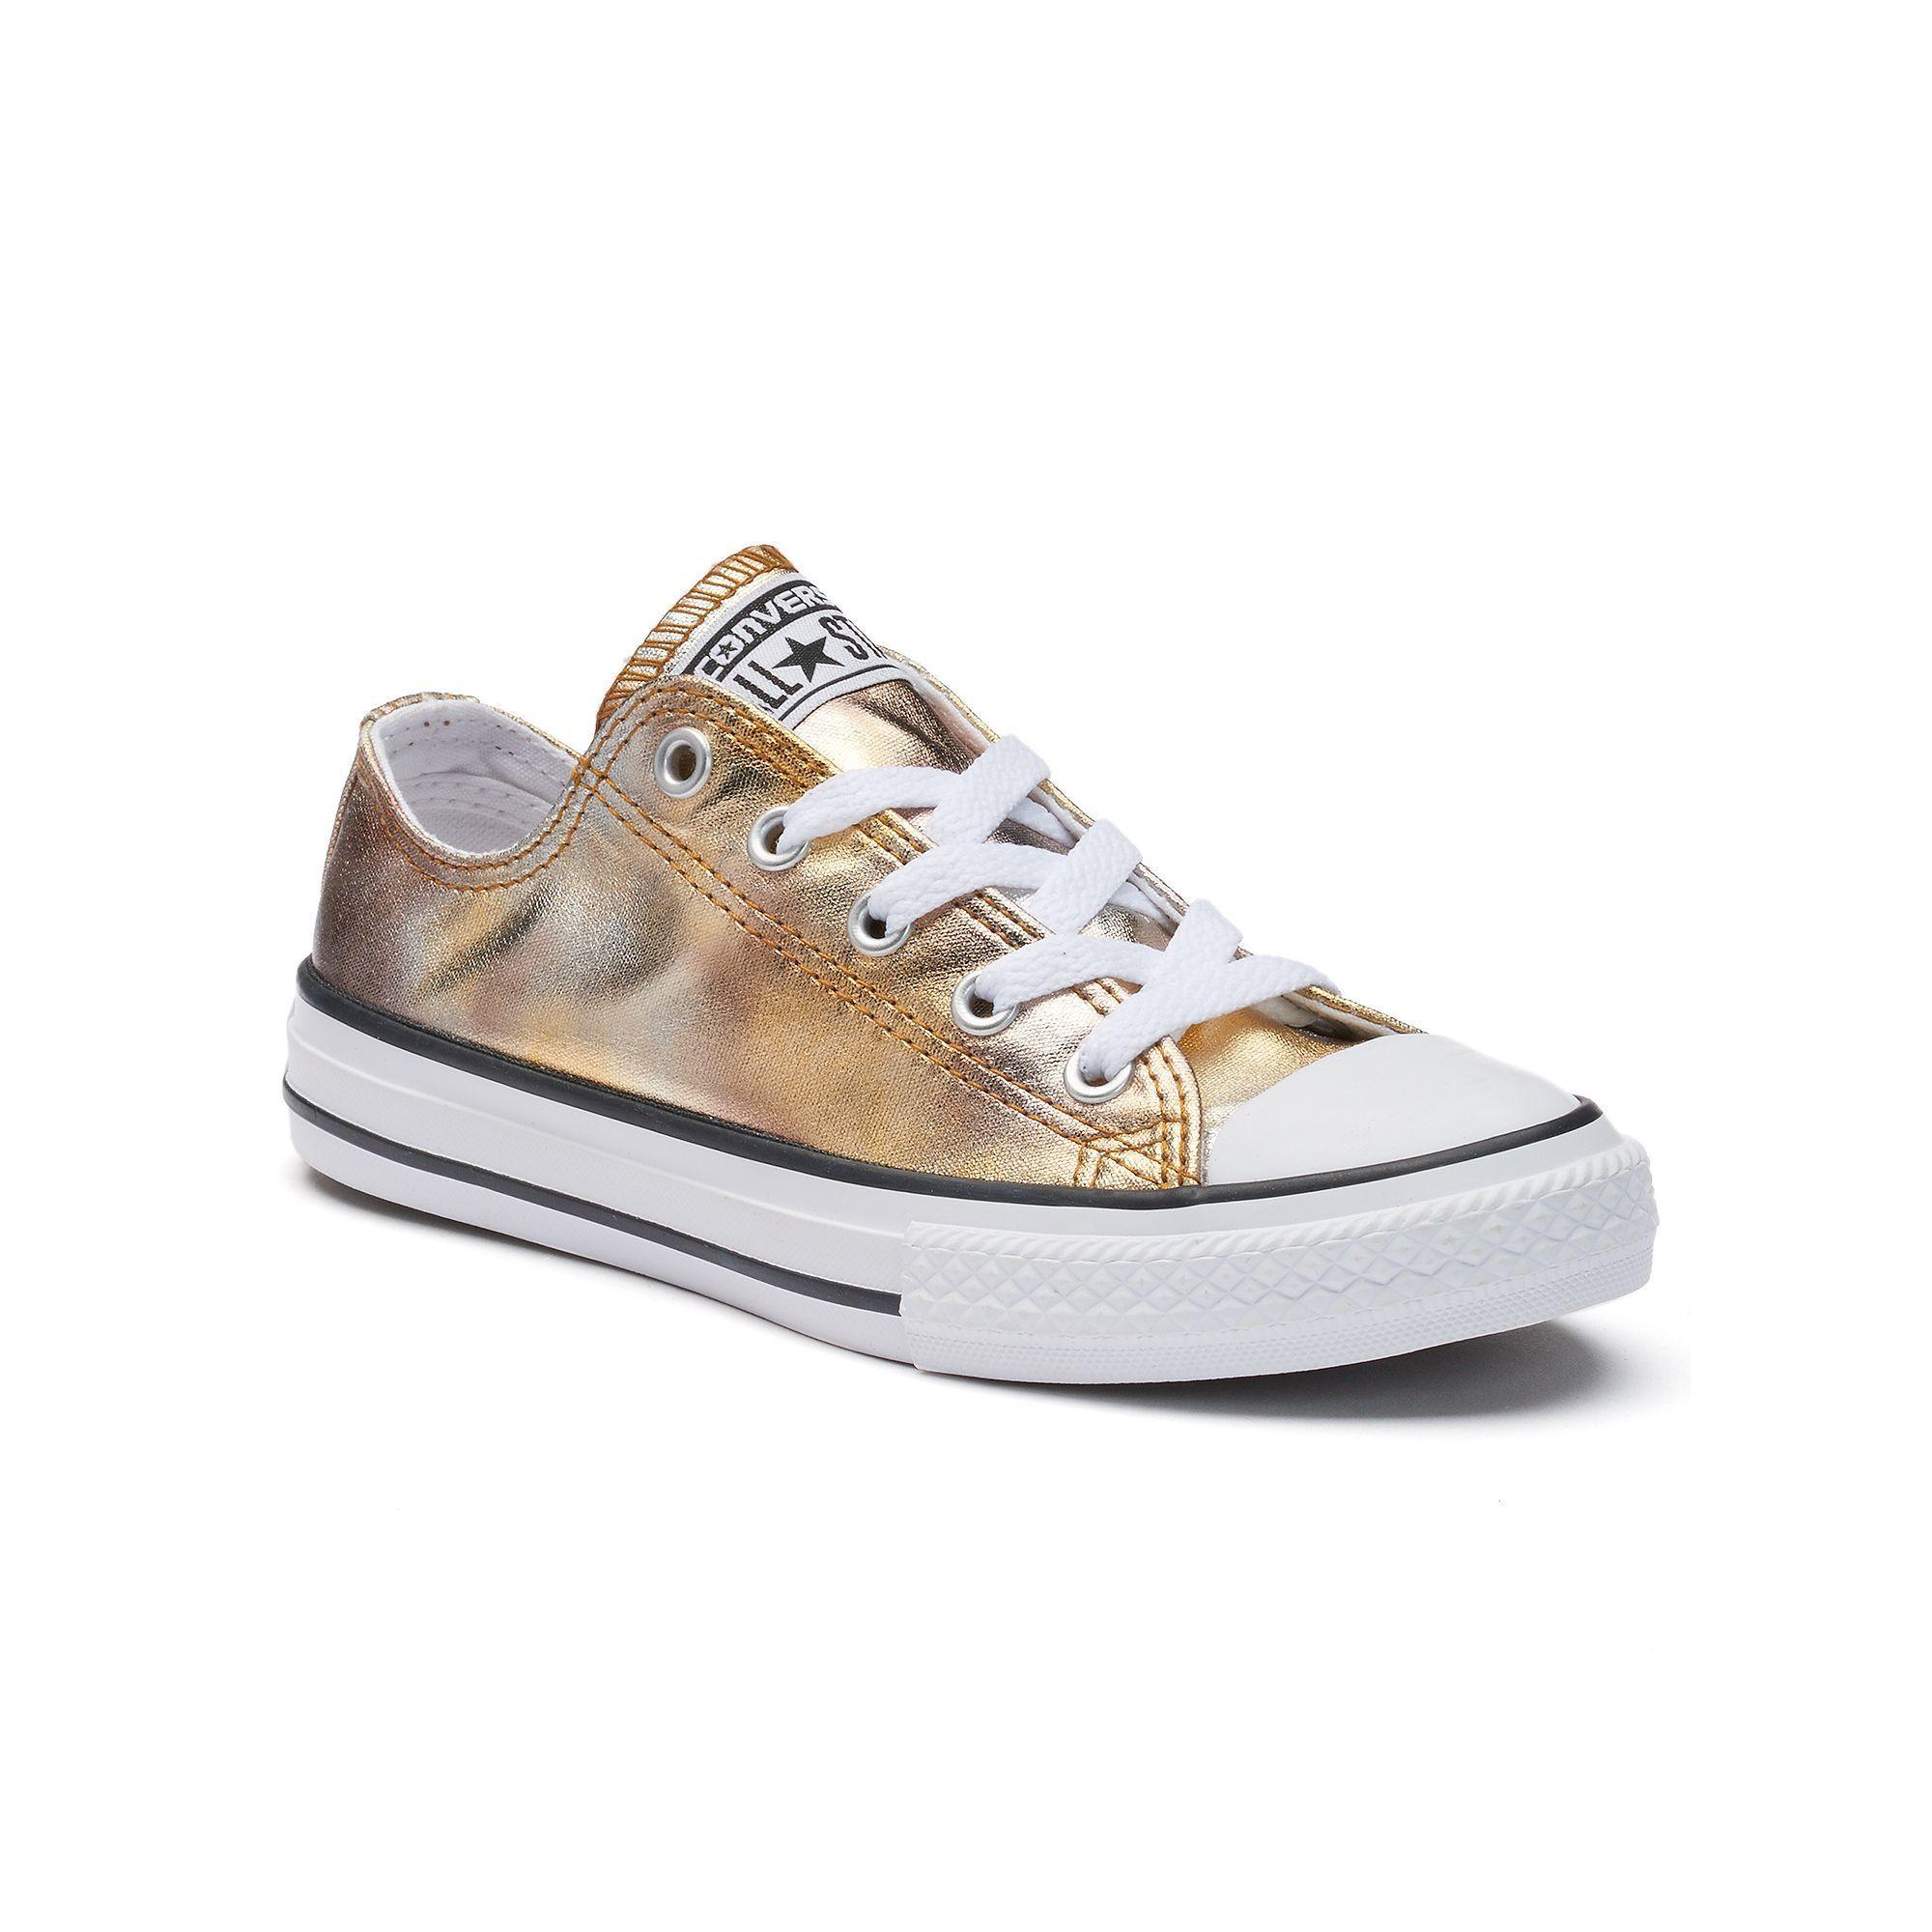 Girls  Converse Chuck Taylor All Star Metallic Sneakers in 2019 ... 9e14523ef